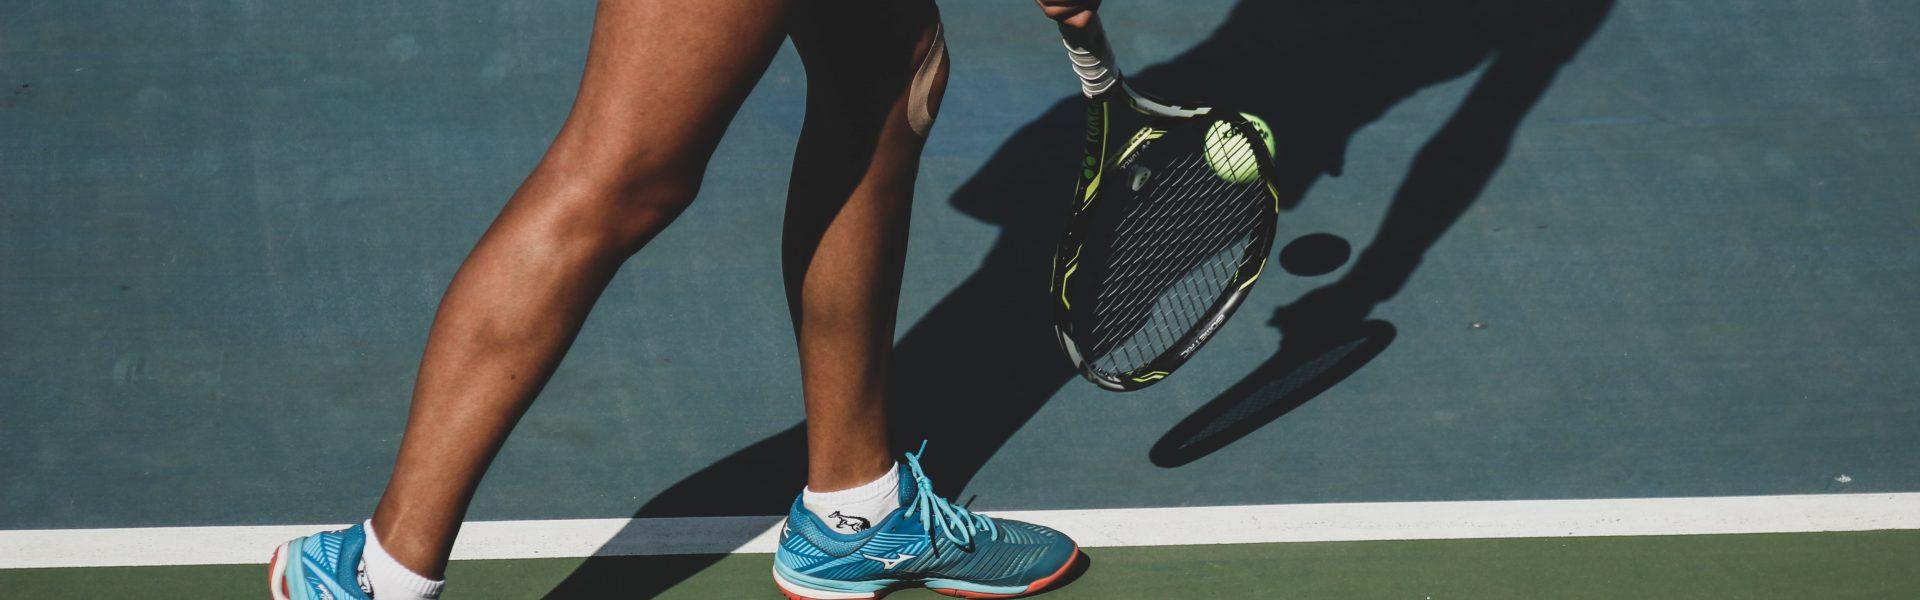 tennissko dame